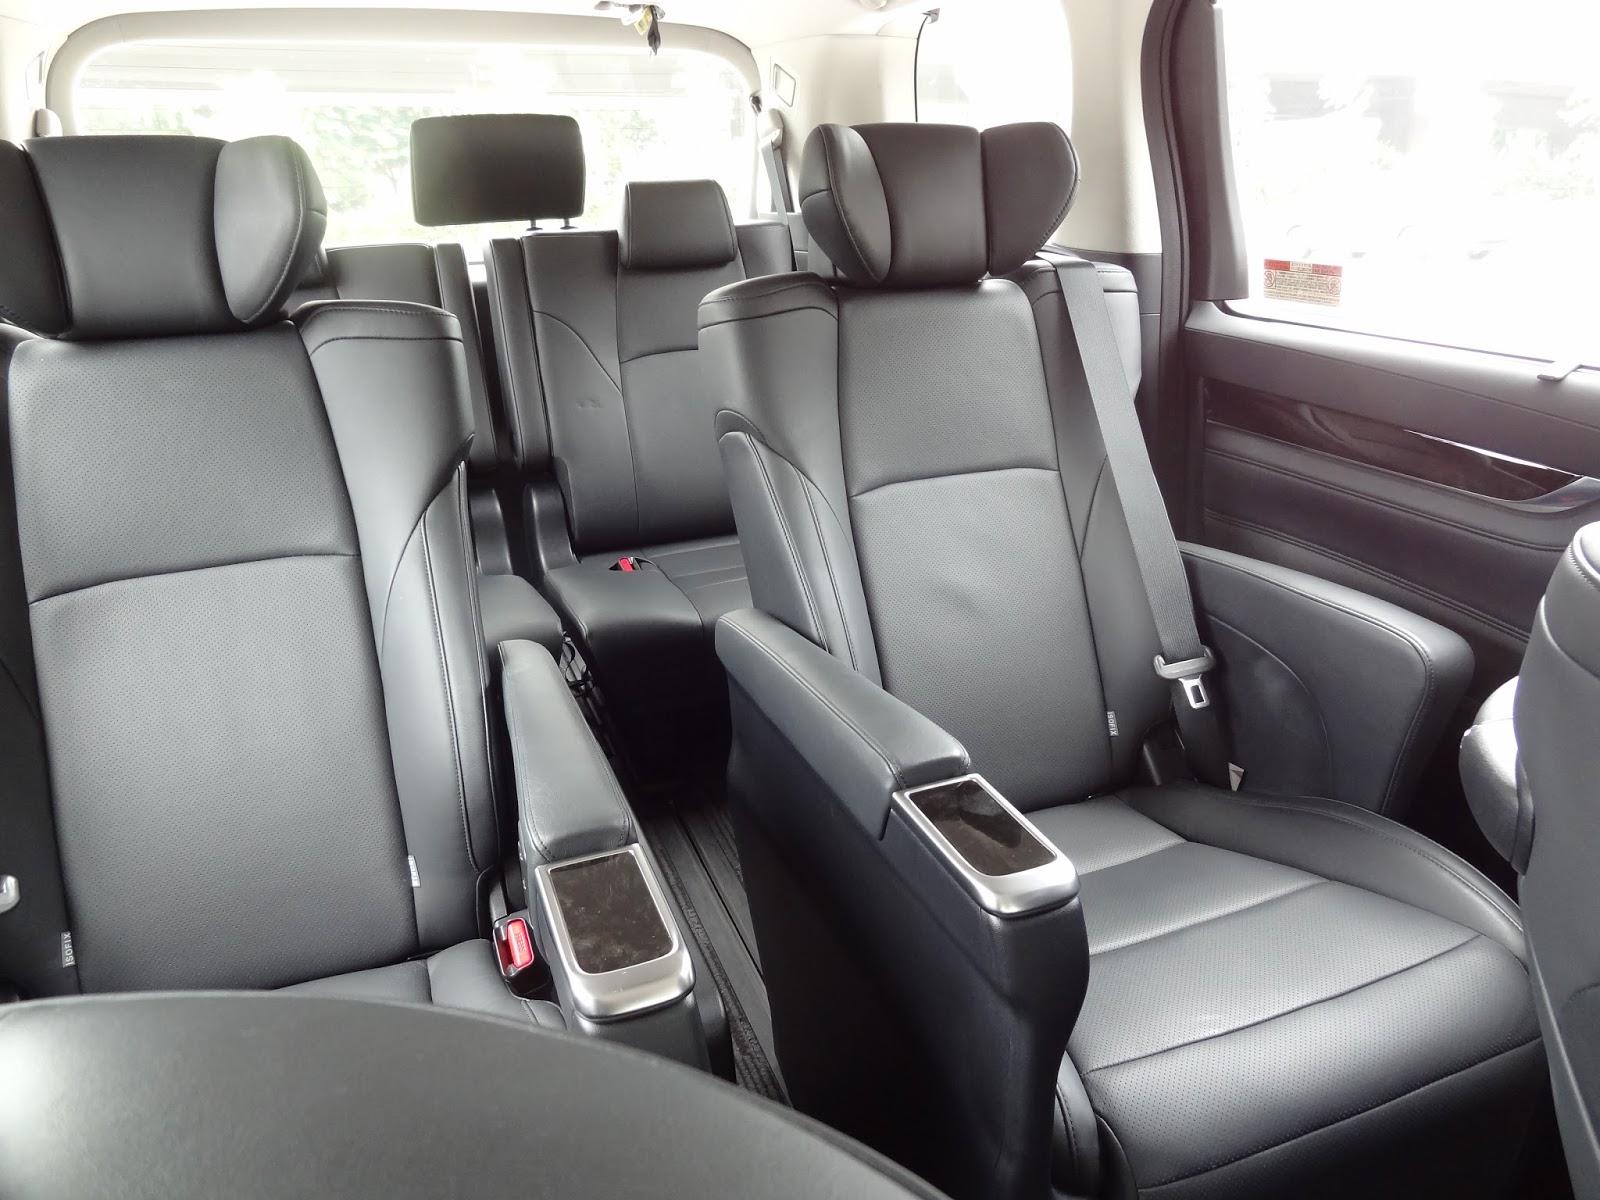 Shaun Owyeong: Toyota Vellfire 2 5 Elegance [Car Review]